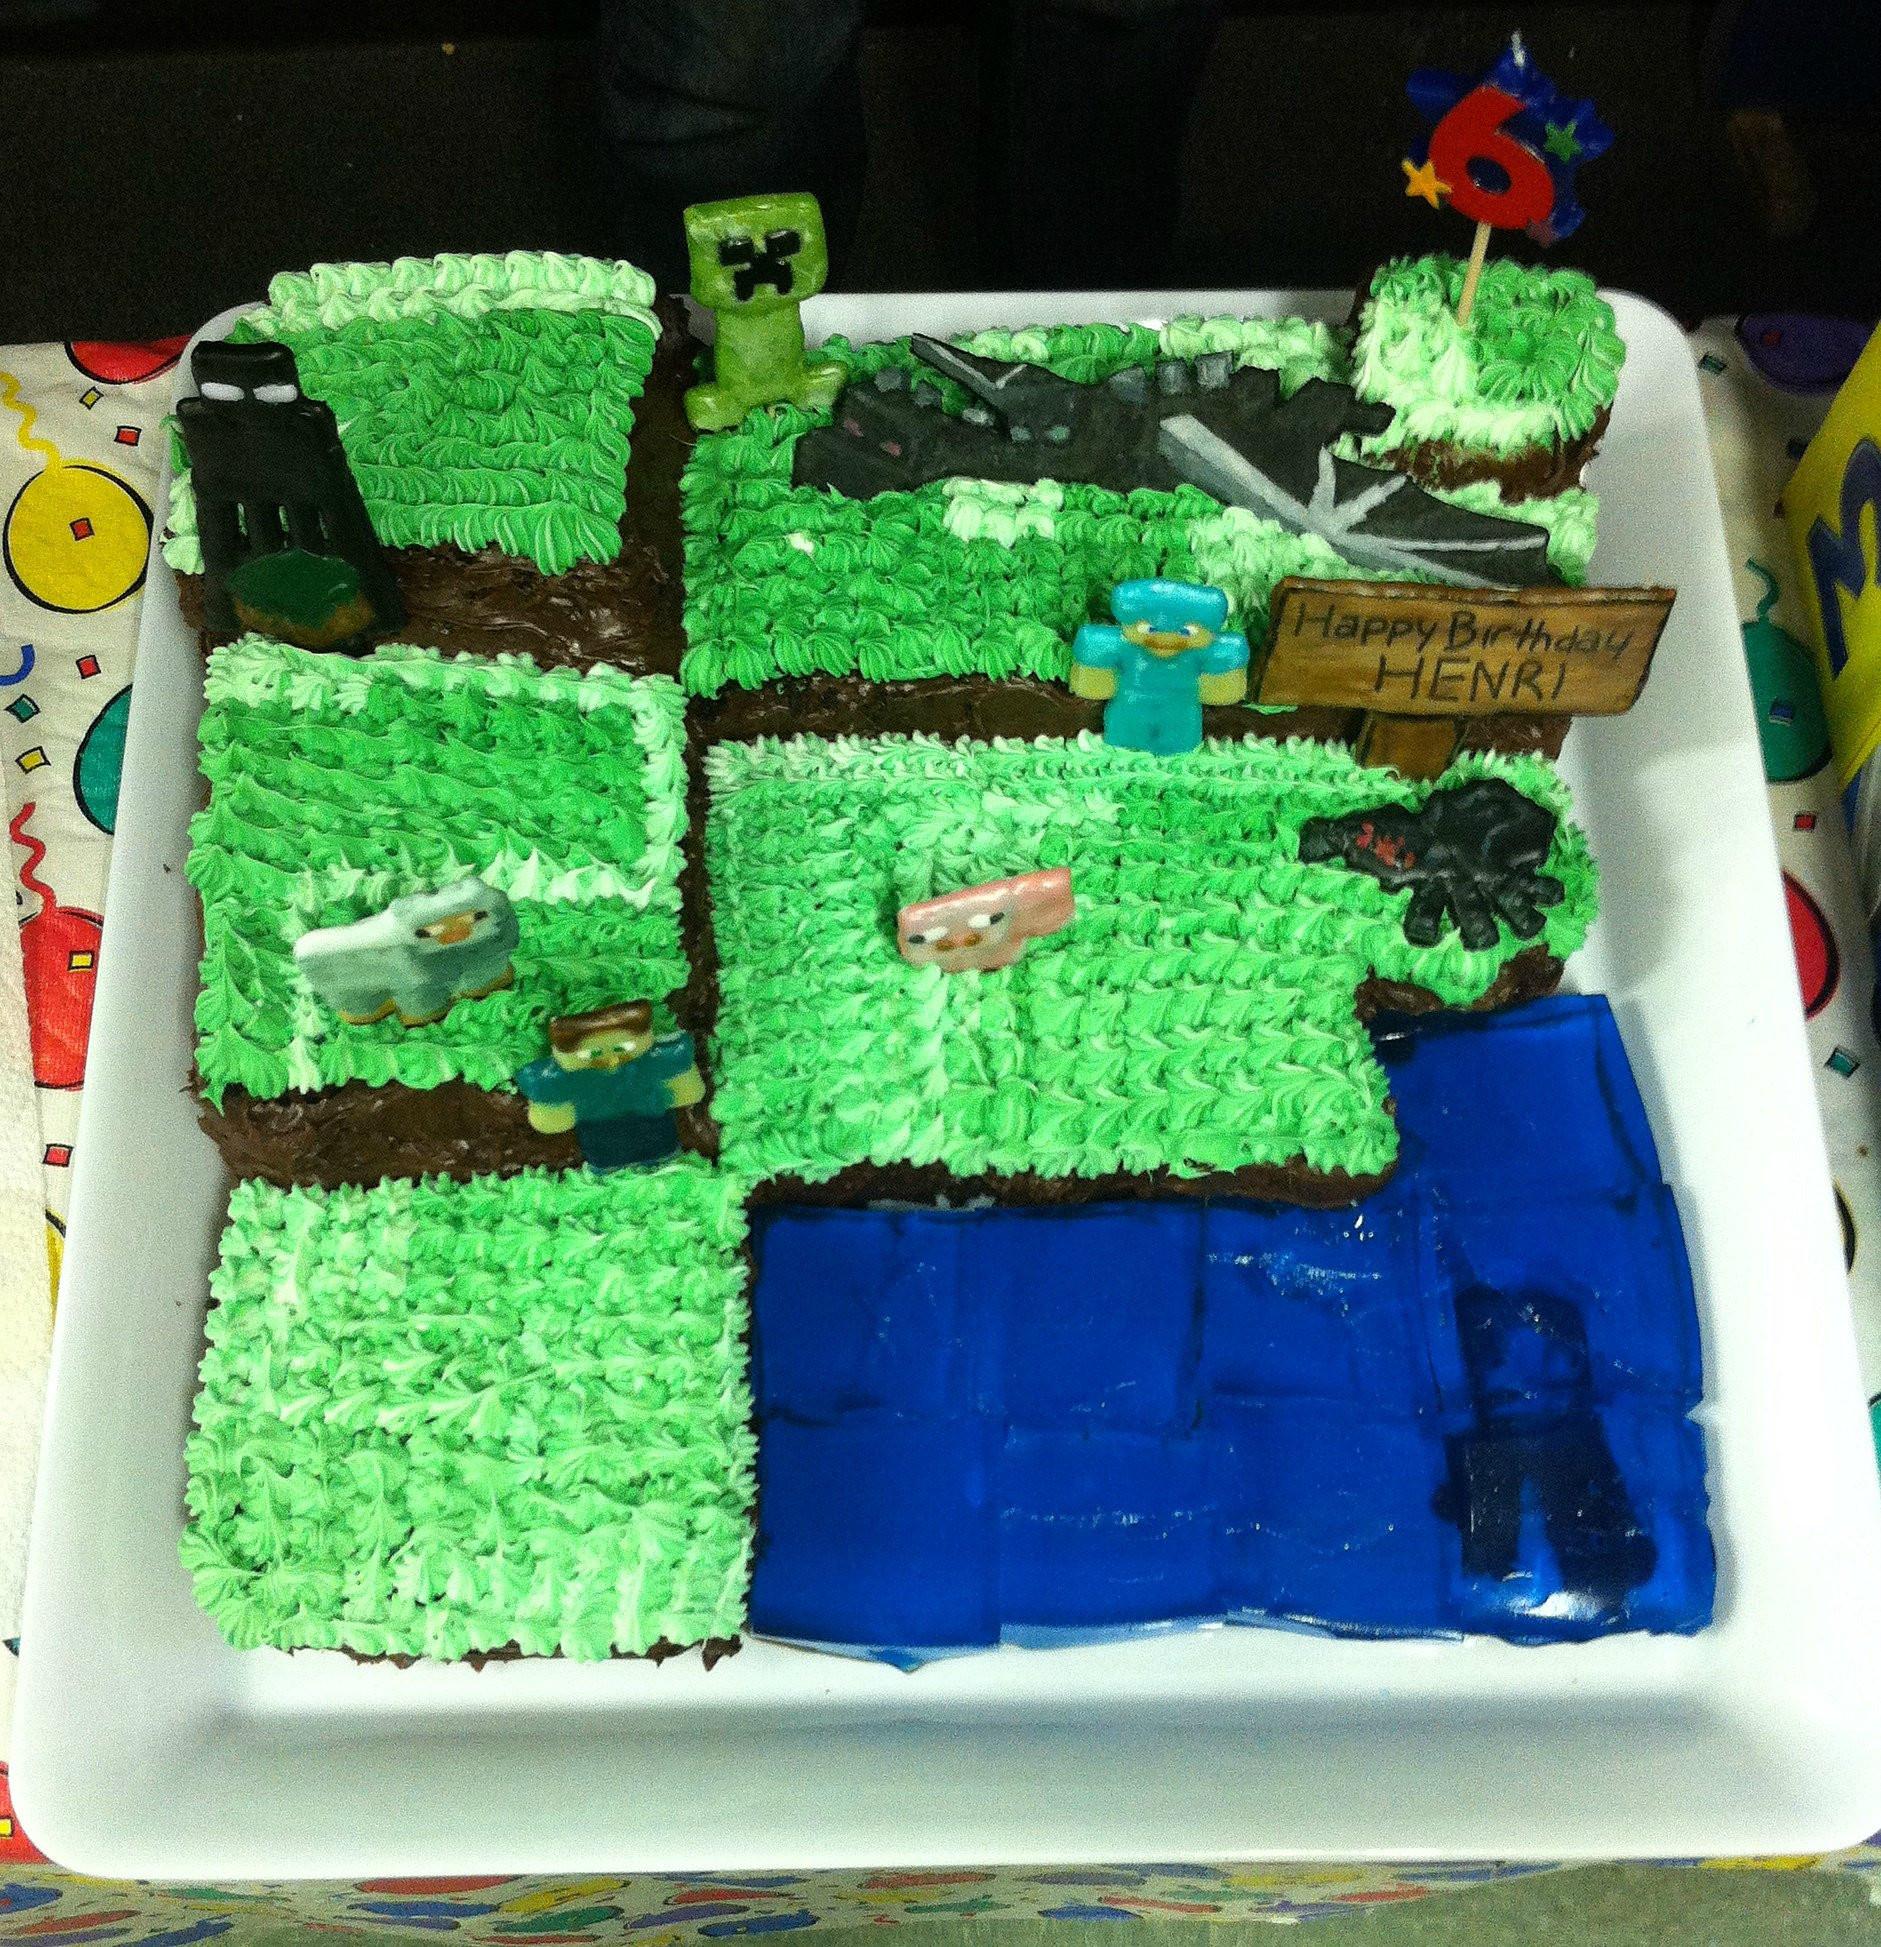 How To Make A Minecraft Birthday Cake  20 Best Ideas Minecraft Birthday Cake Home Inspiration